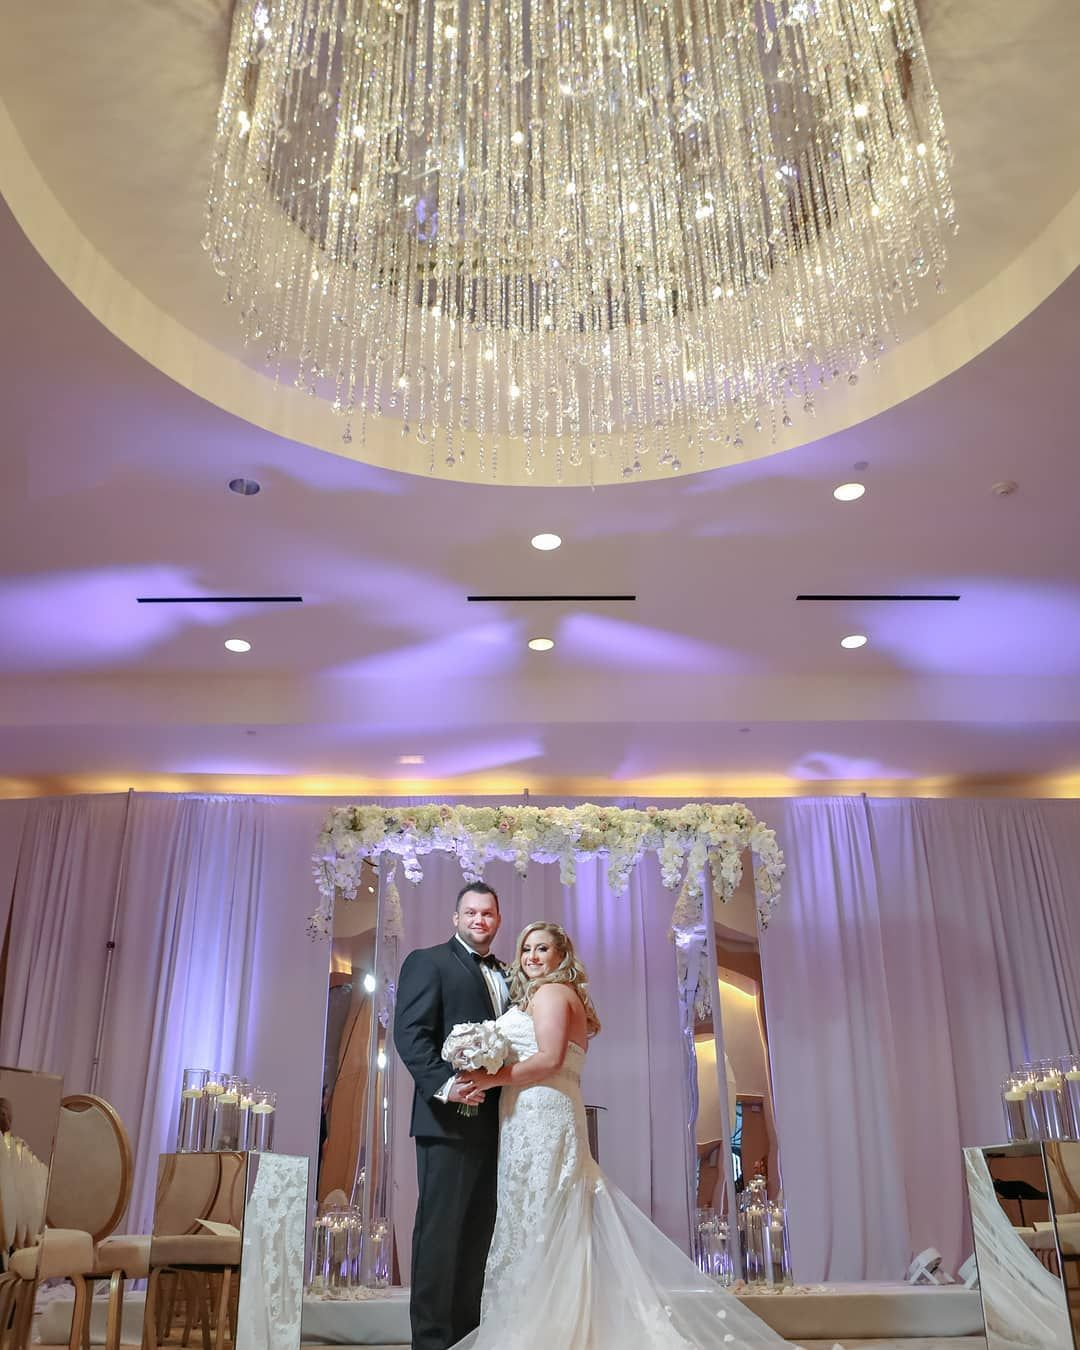 The Most Glam Couple Magazine Rentmywedding Lighting Rentmywedding Photography Emilyharrisphotography Vend In 2020 Event Inspiration Wedding Events Inspiration